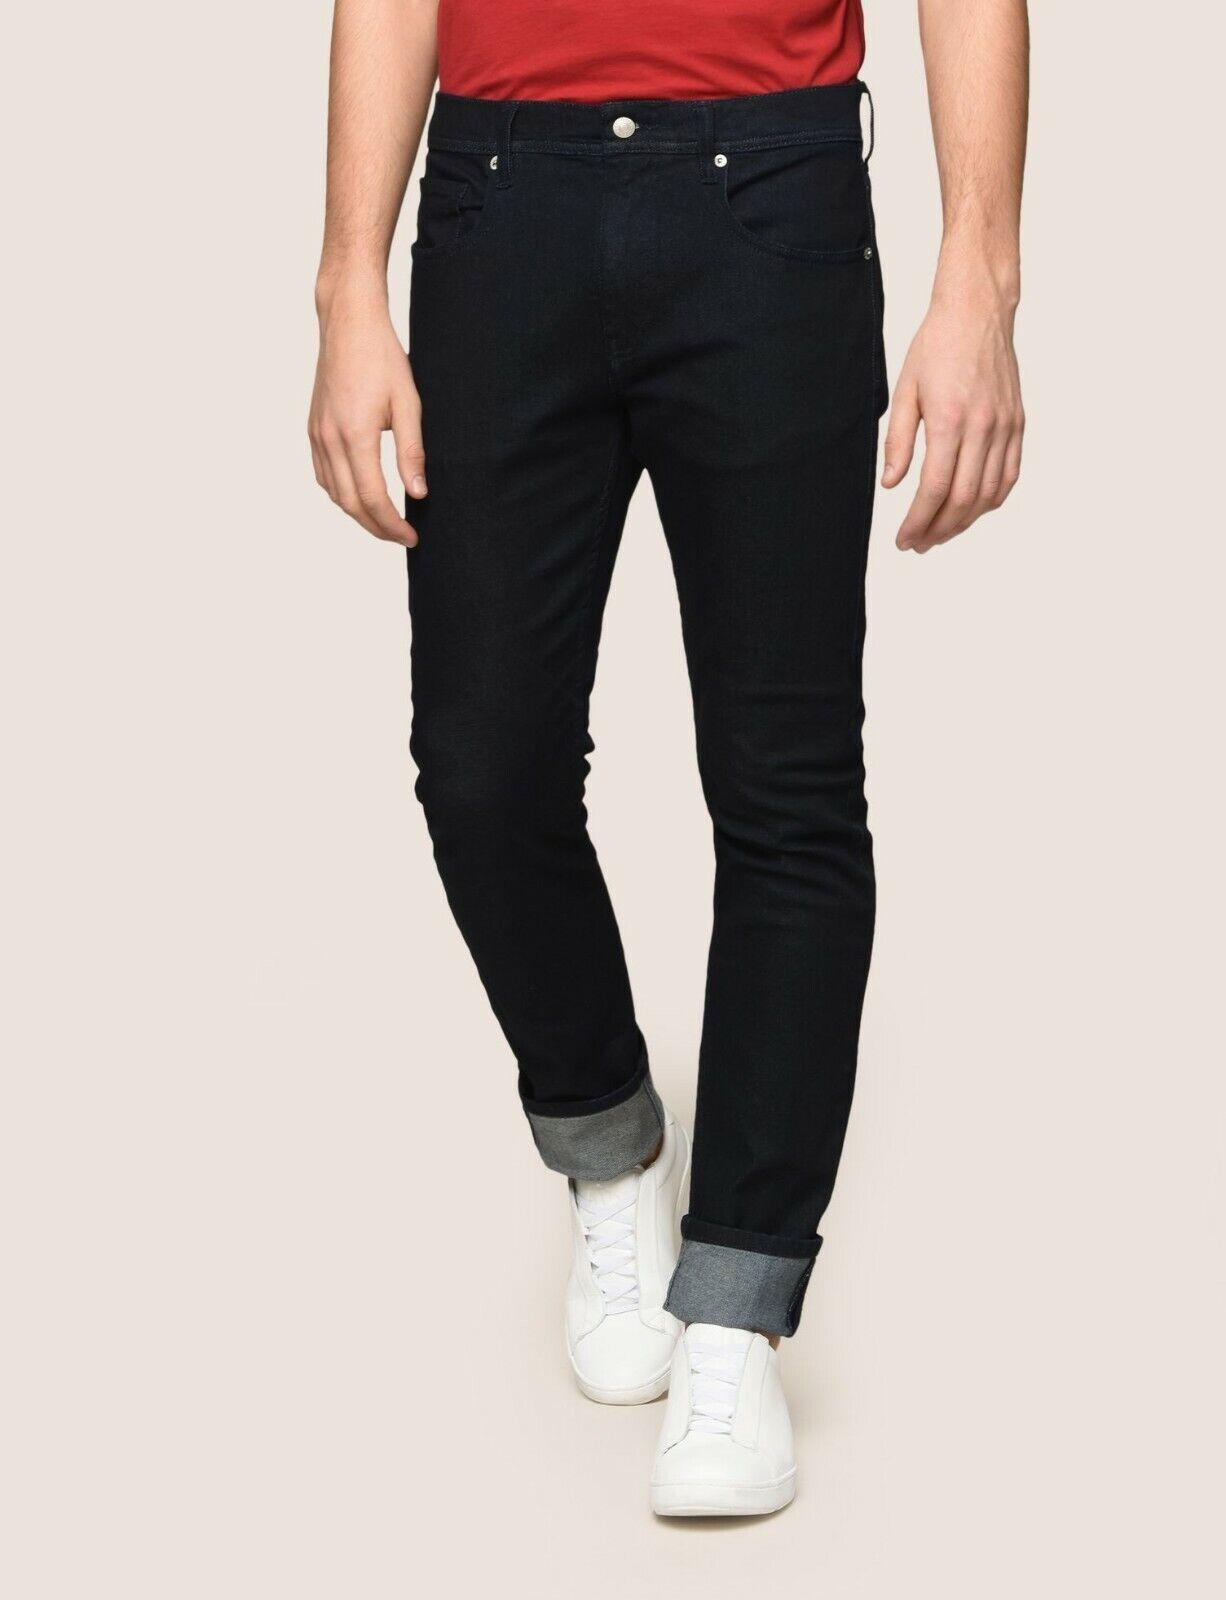 ARMANI EXCHANGE Authentic Slim Fit Jean Dark Indigo NWT